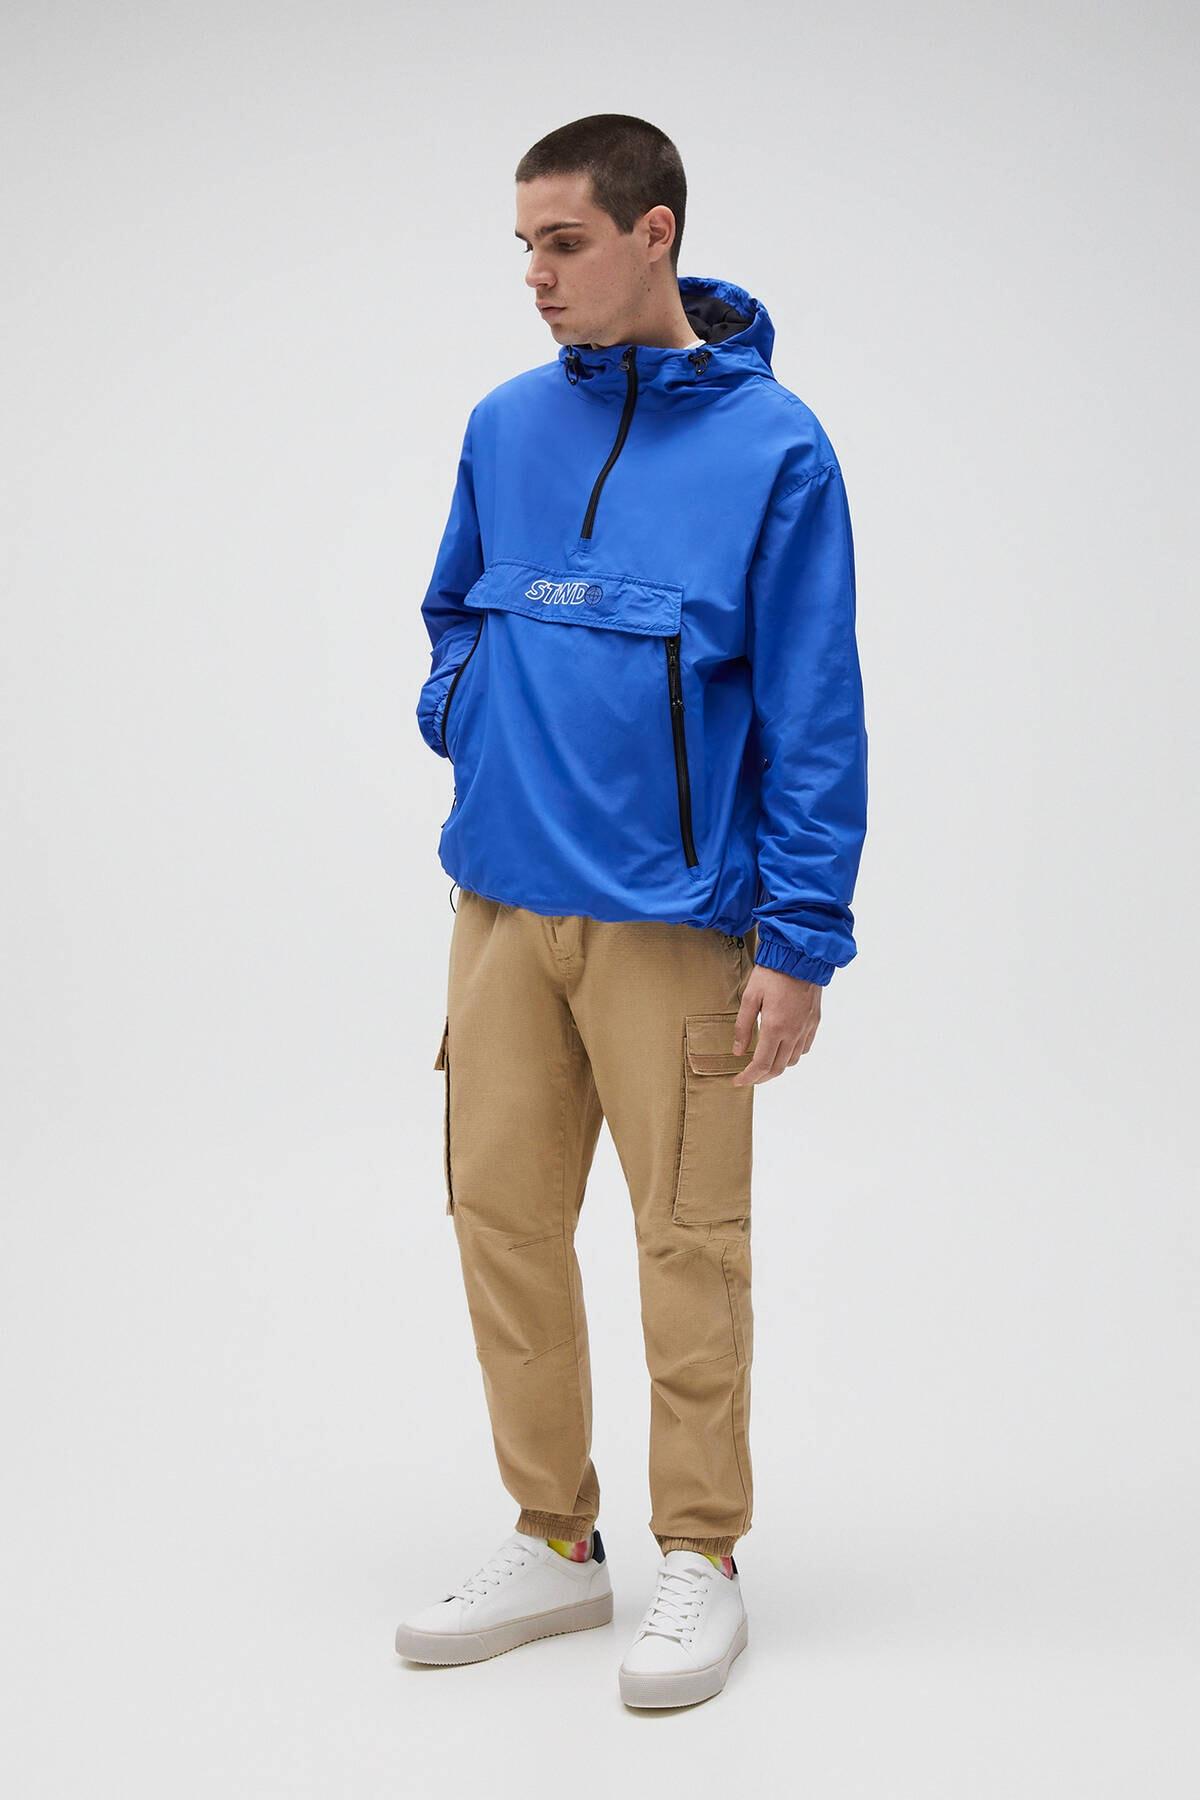 Pull & Bear Erkek Yoğun Mavi Basic Stwd Logolu Kanguru Mont 04711541 2